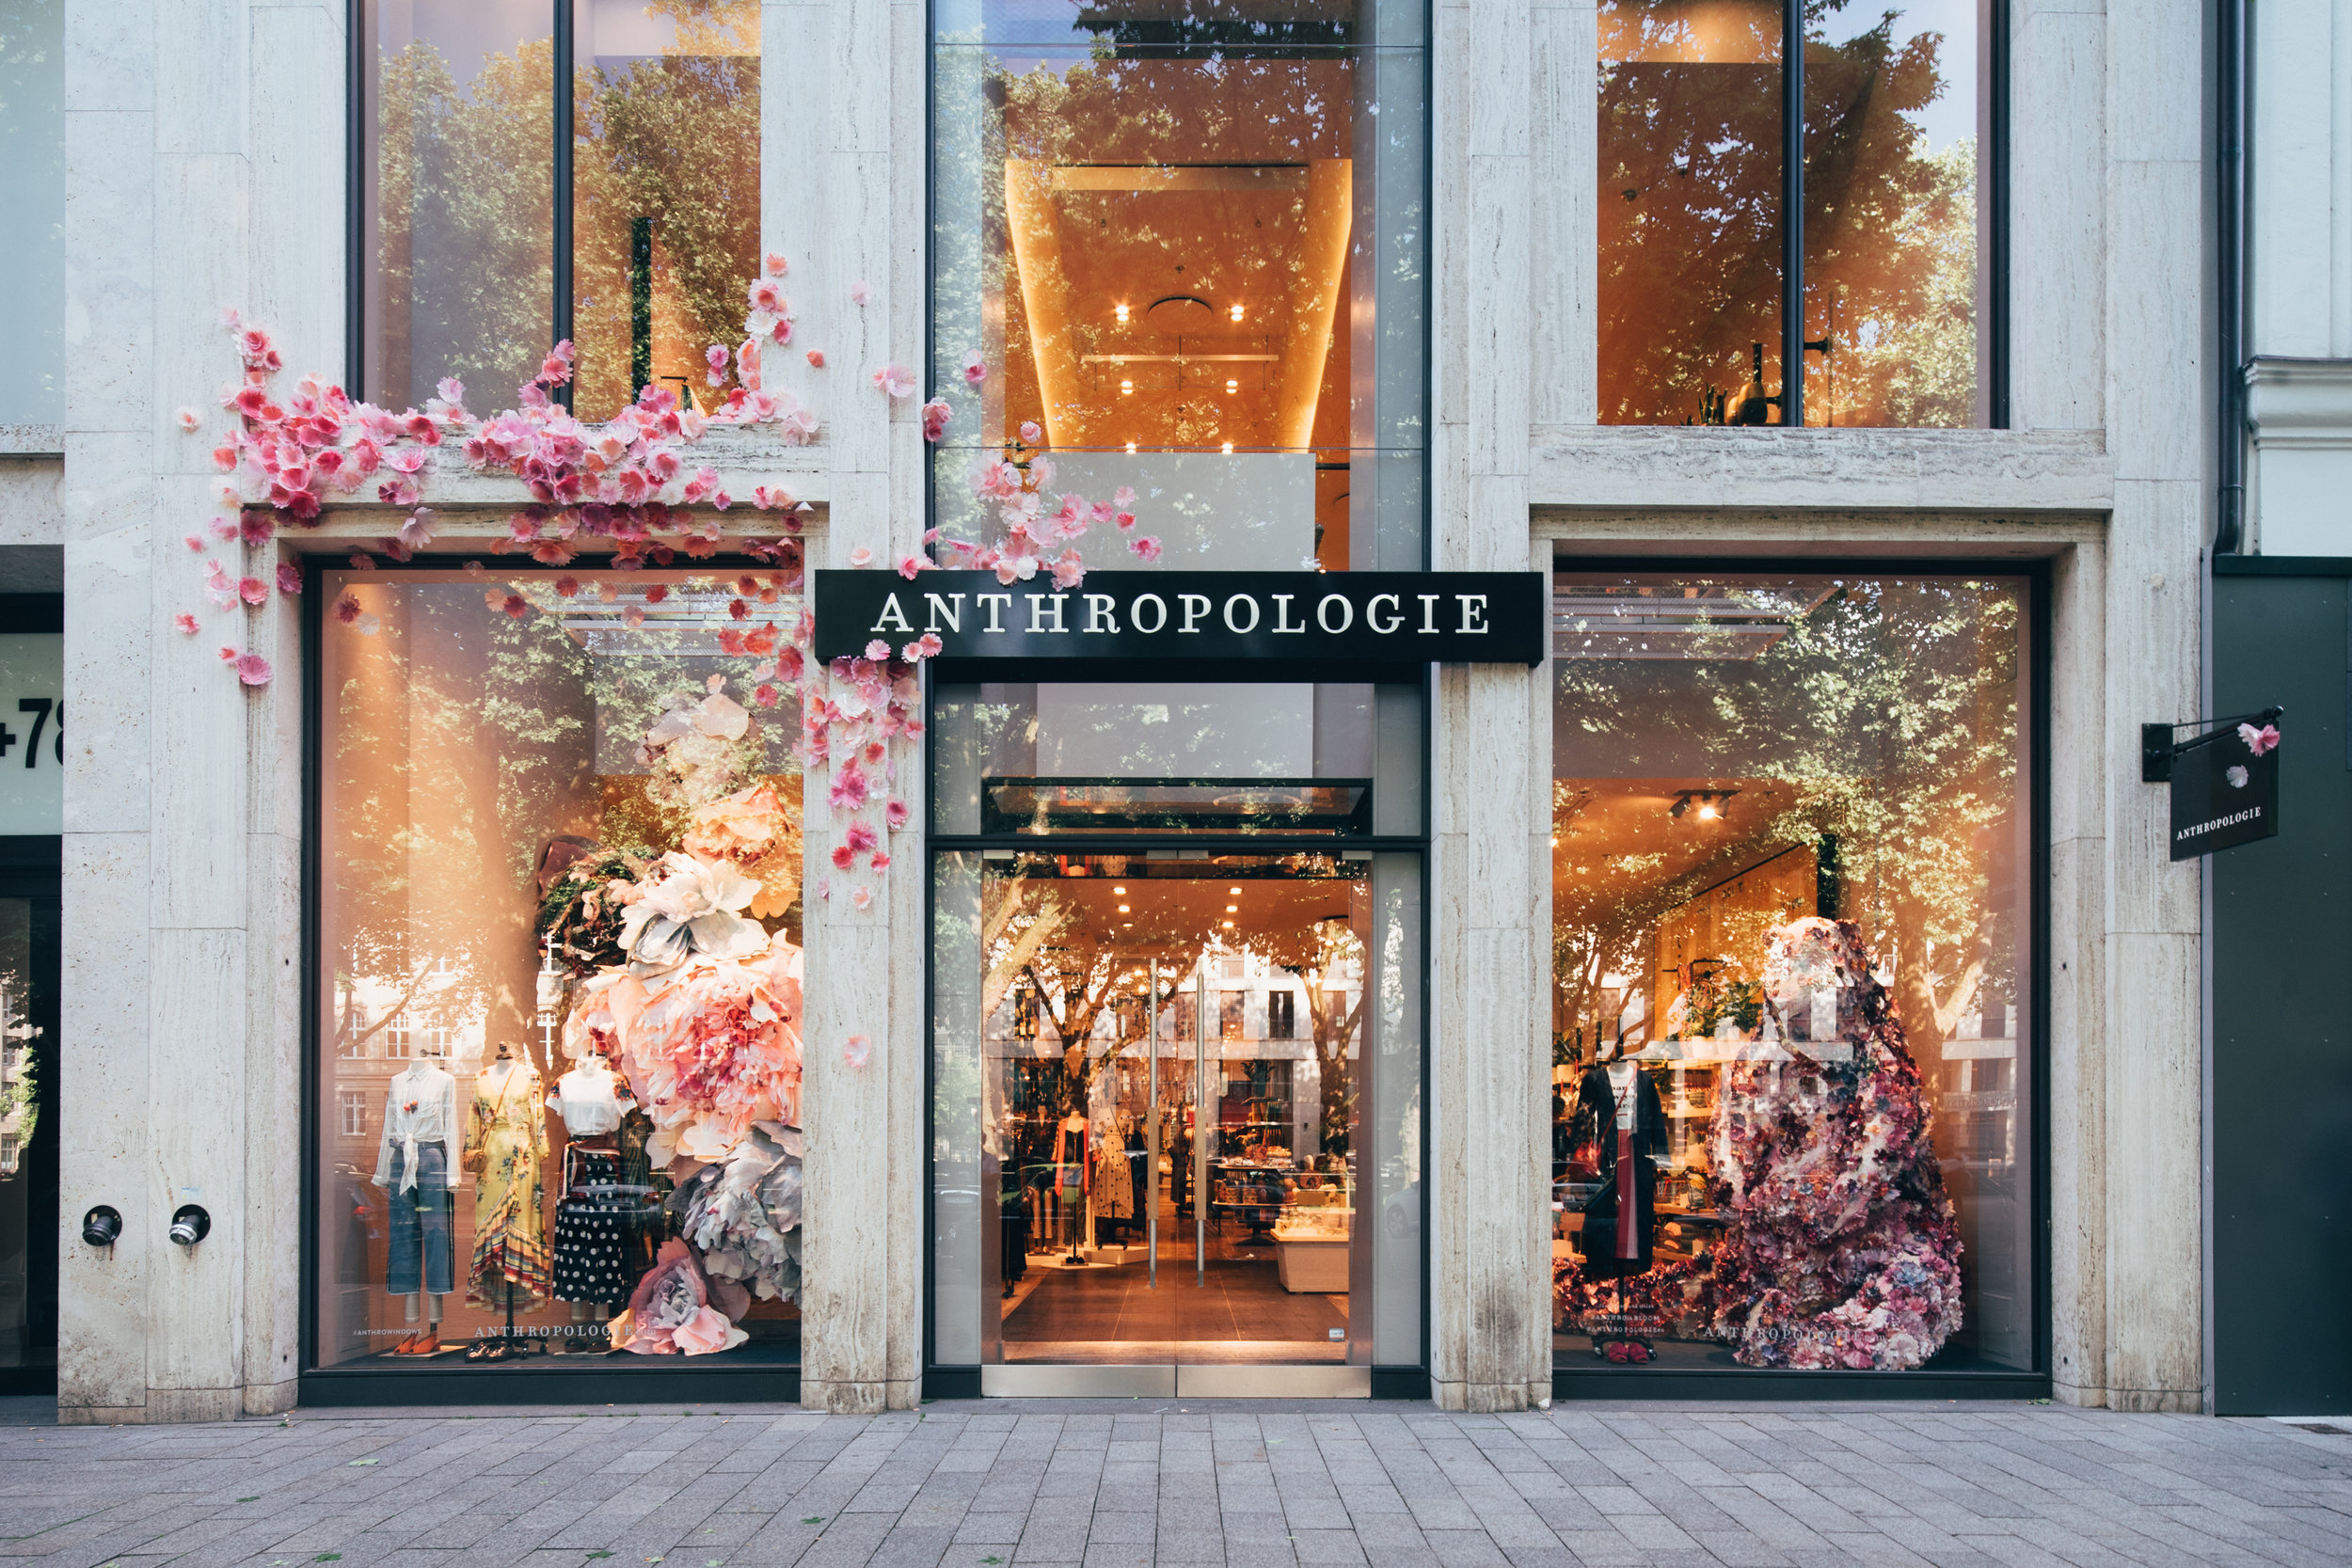 Hub Dot Dusseldorf & Anthropologie - Friday 5 October 2018 ● 18.30 - 21.00REGISTER HERE